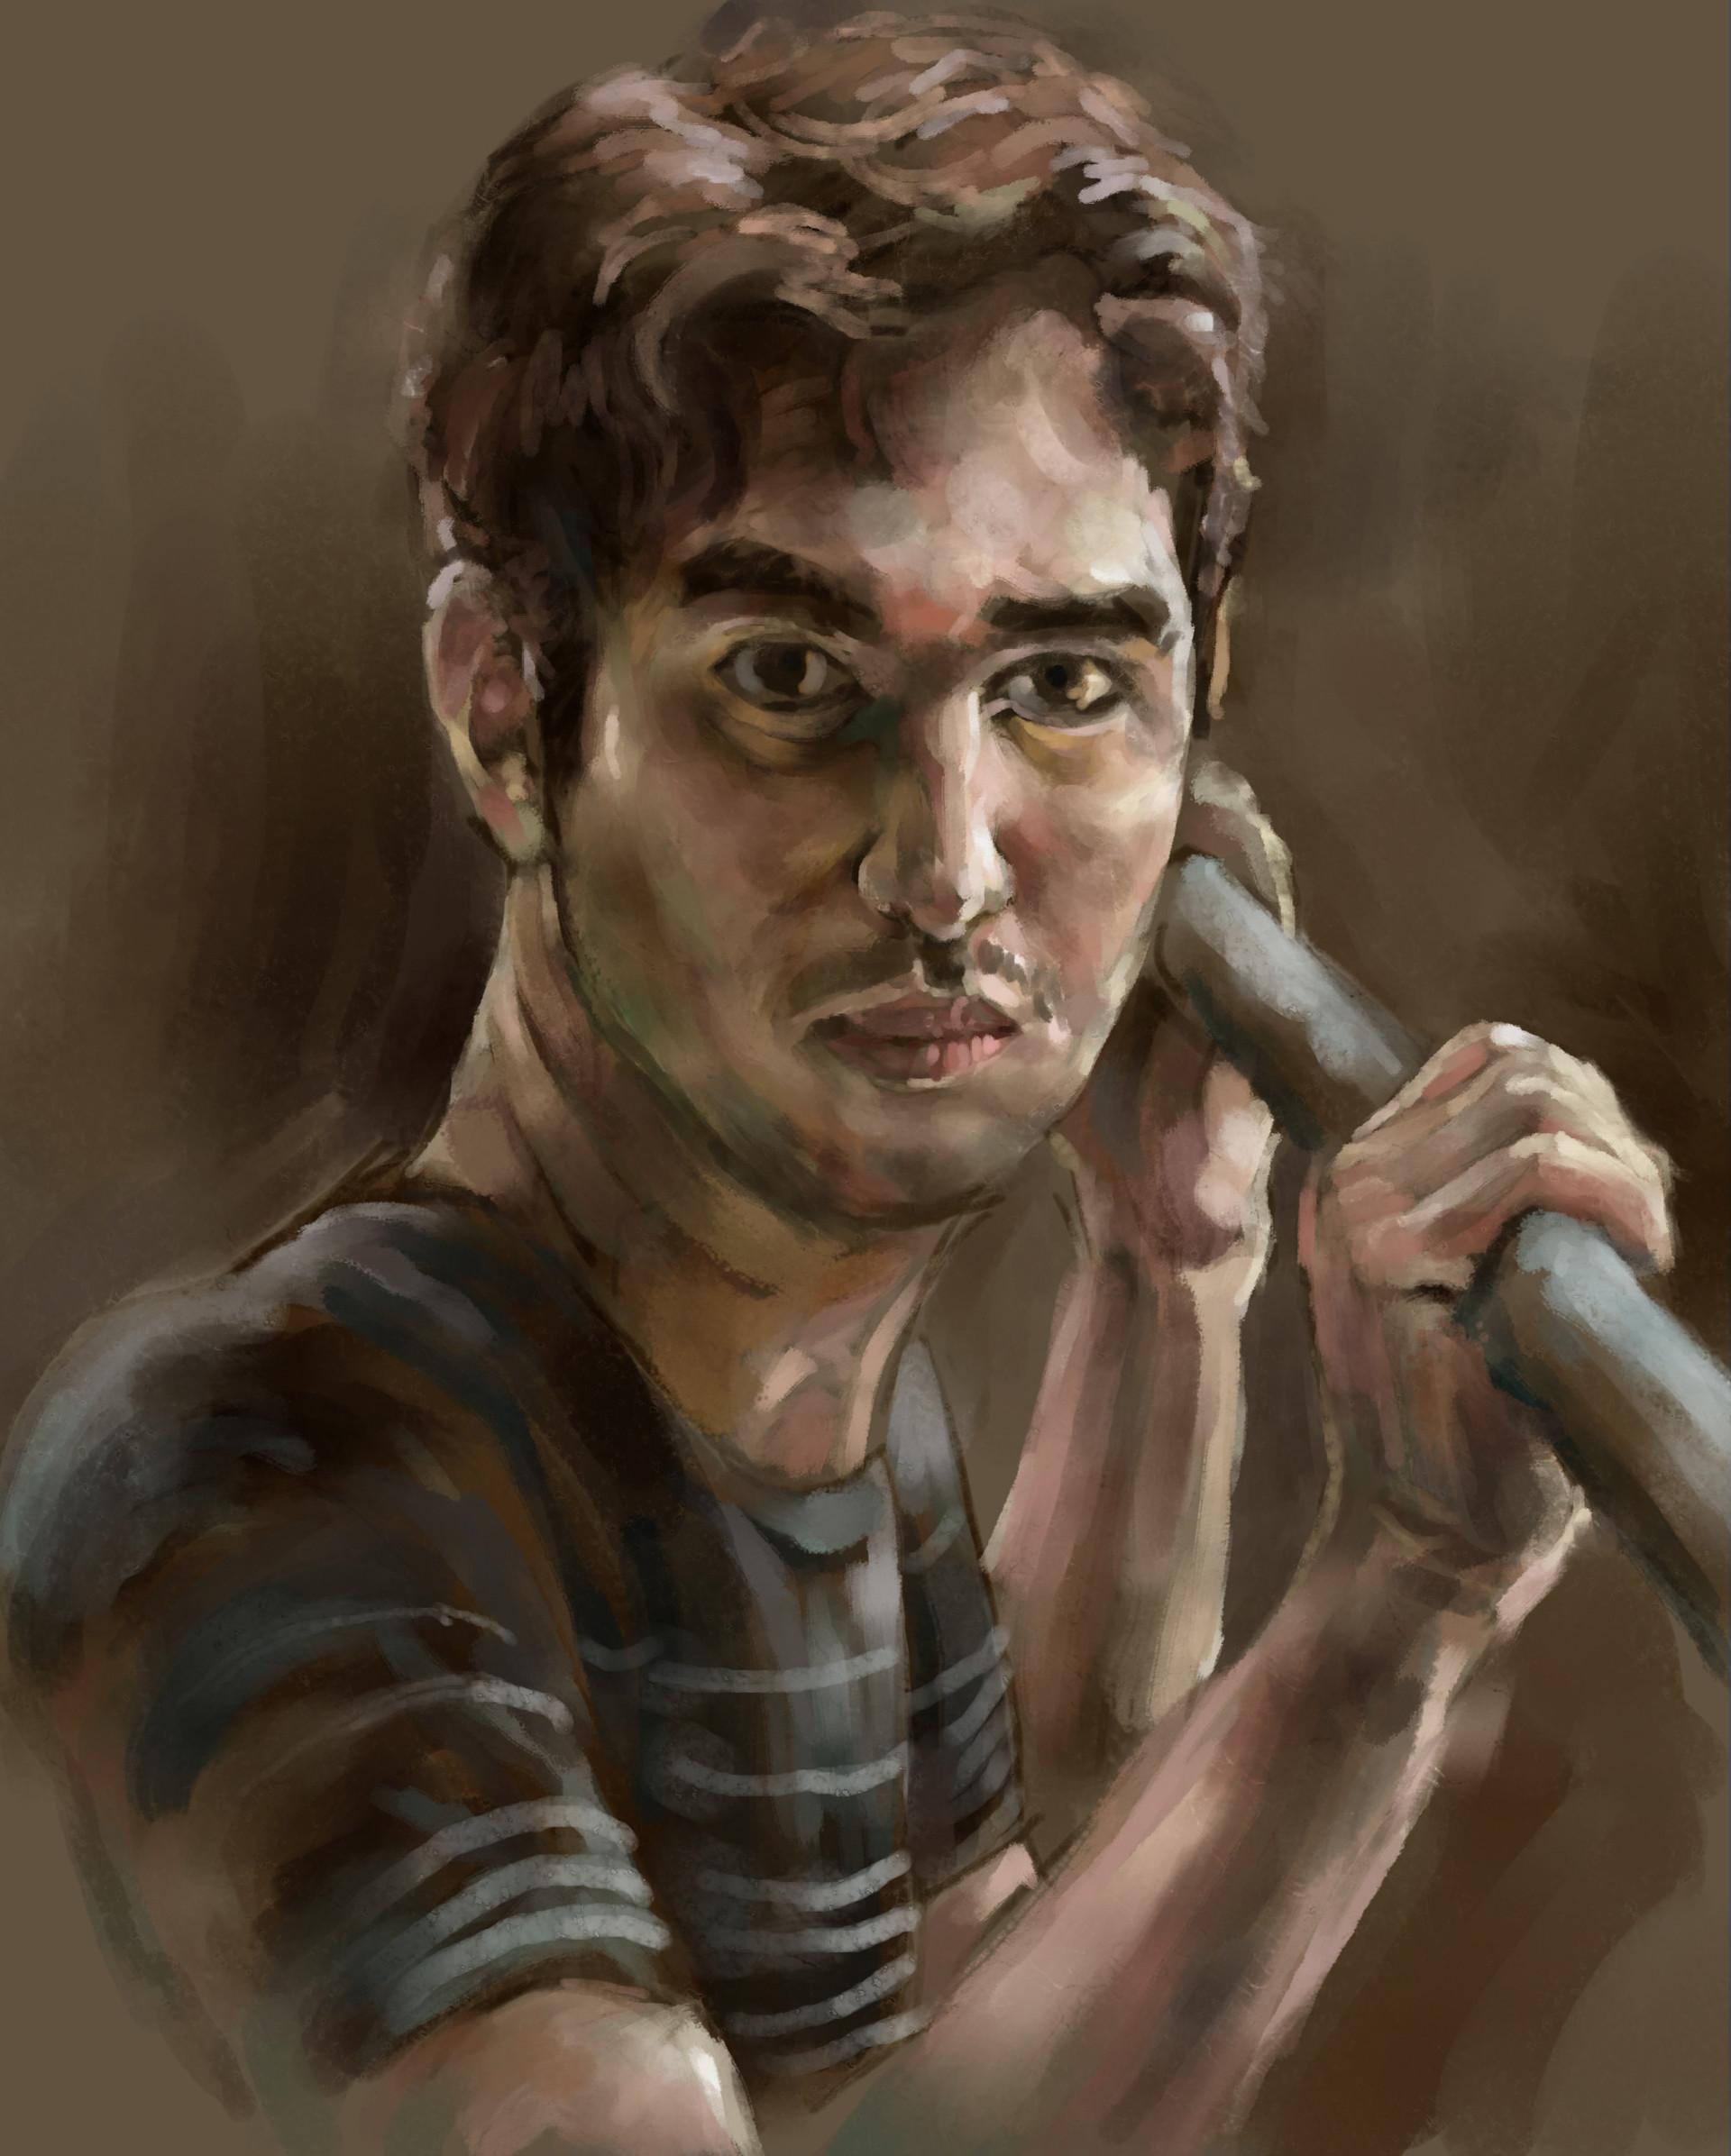 ArtStation - Reddit Gets Drawn portraits, Chris Catizzone